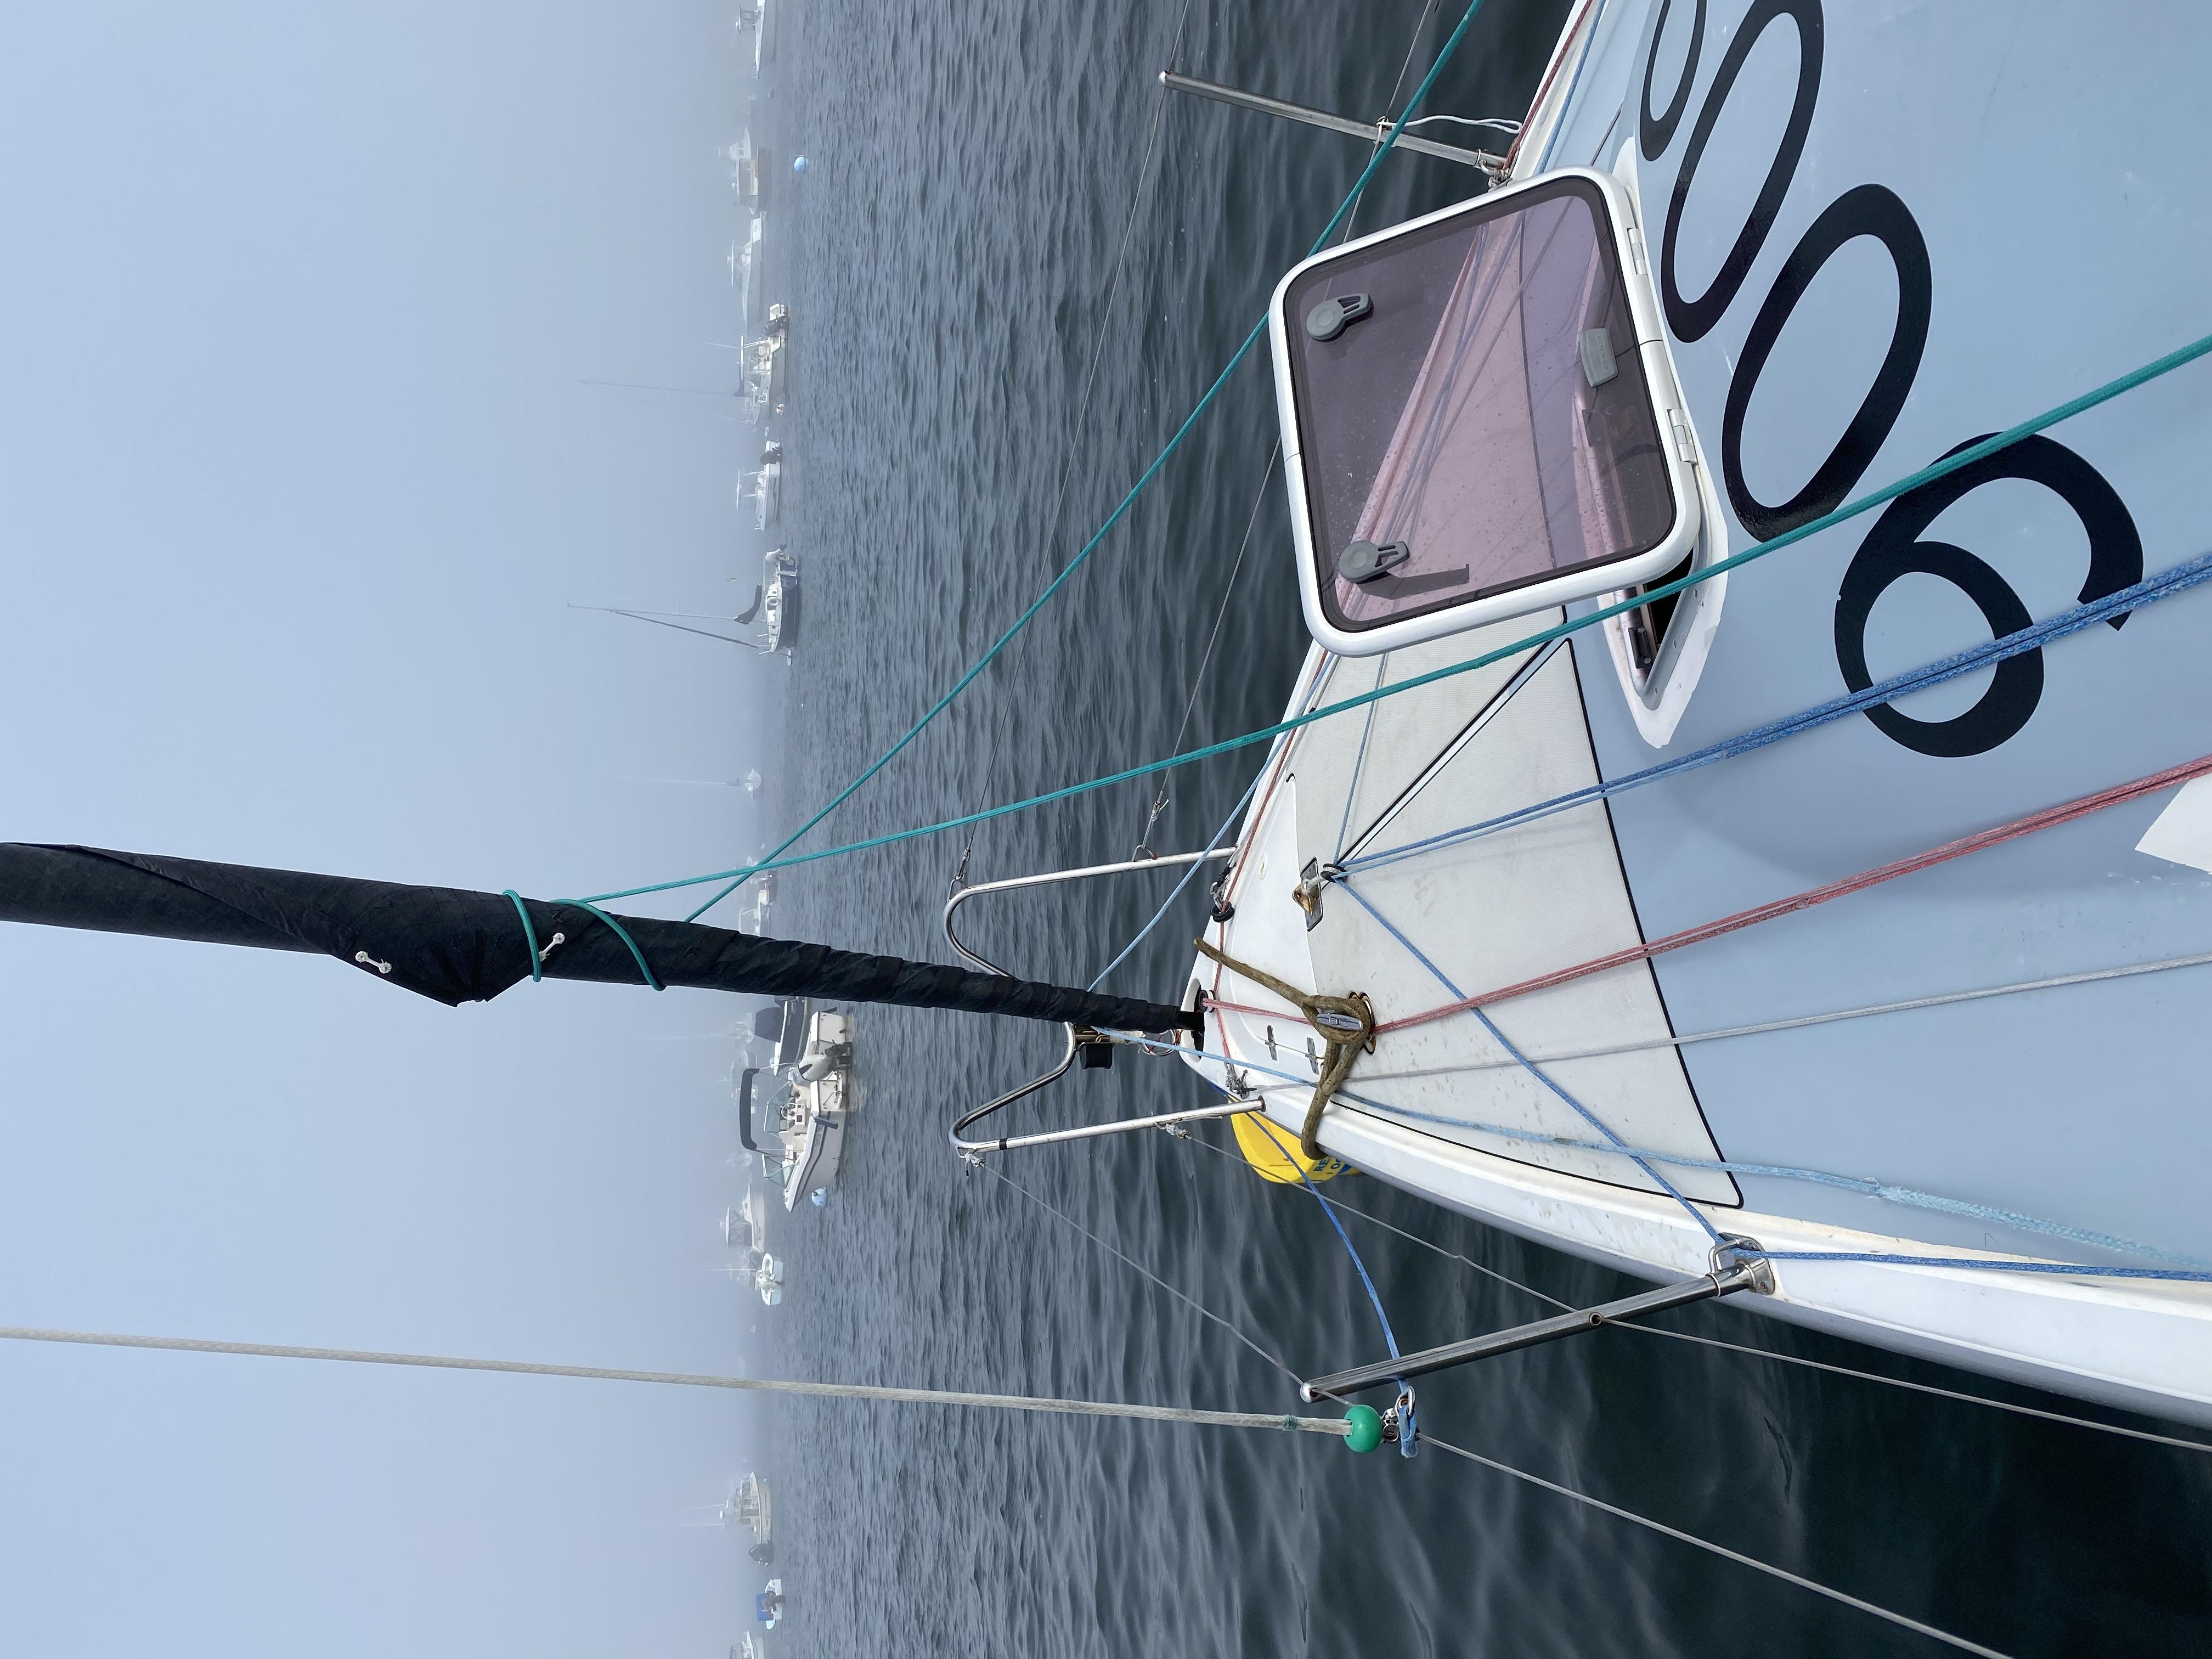 Fog, Fog and more Fog – But we did sail